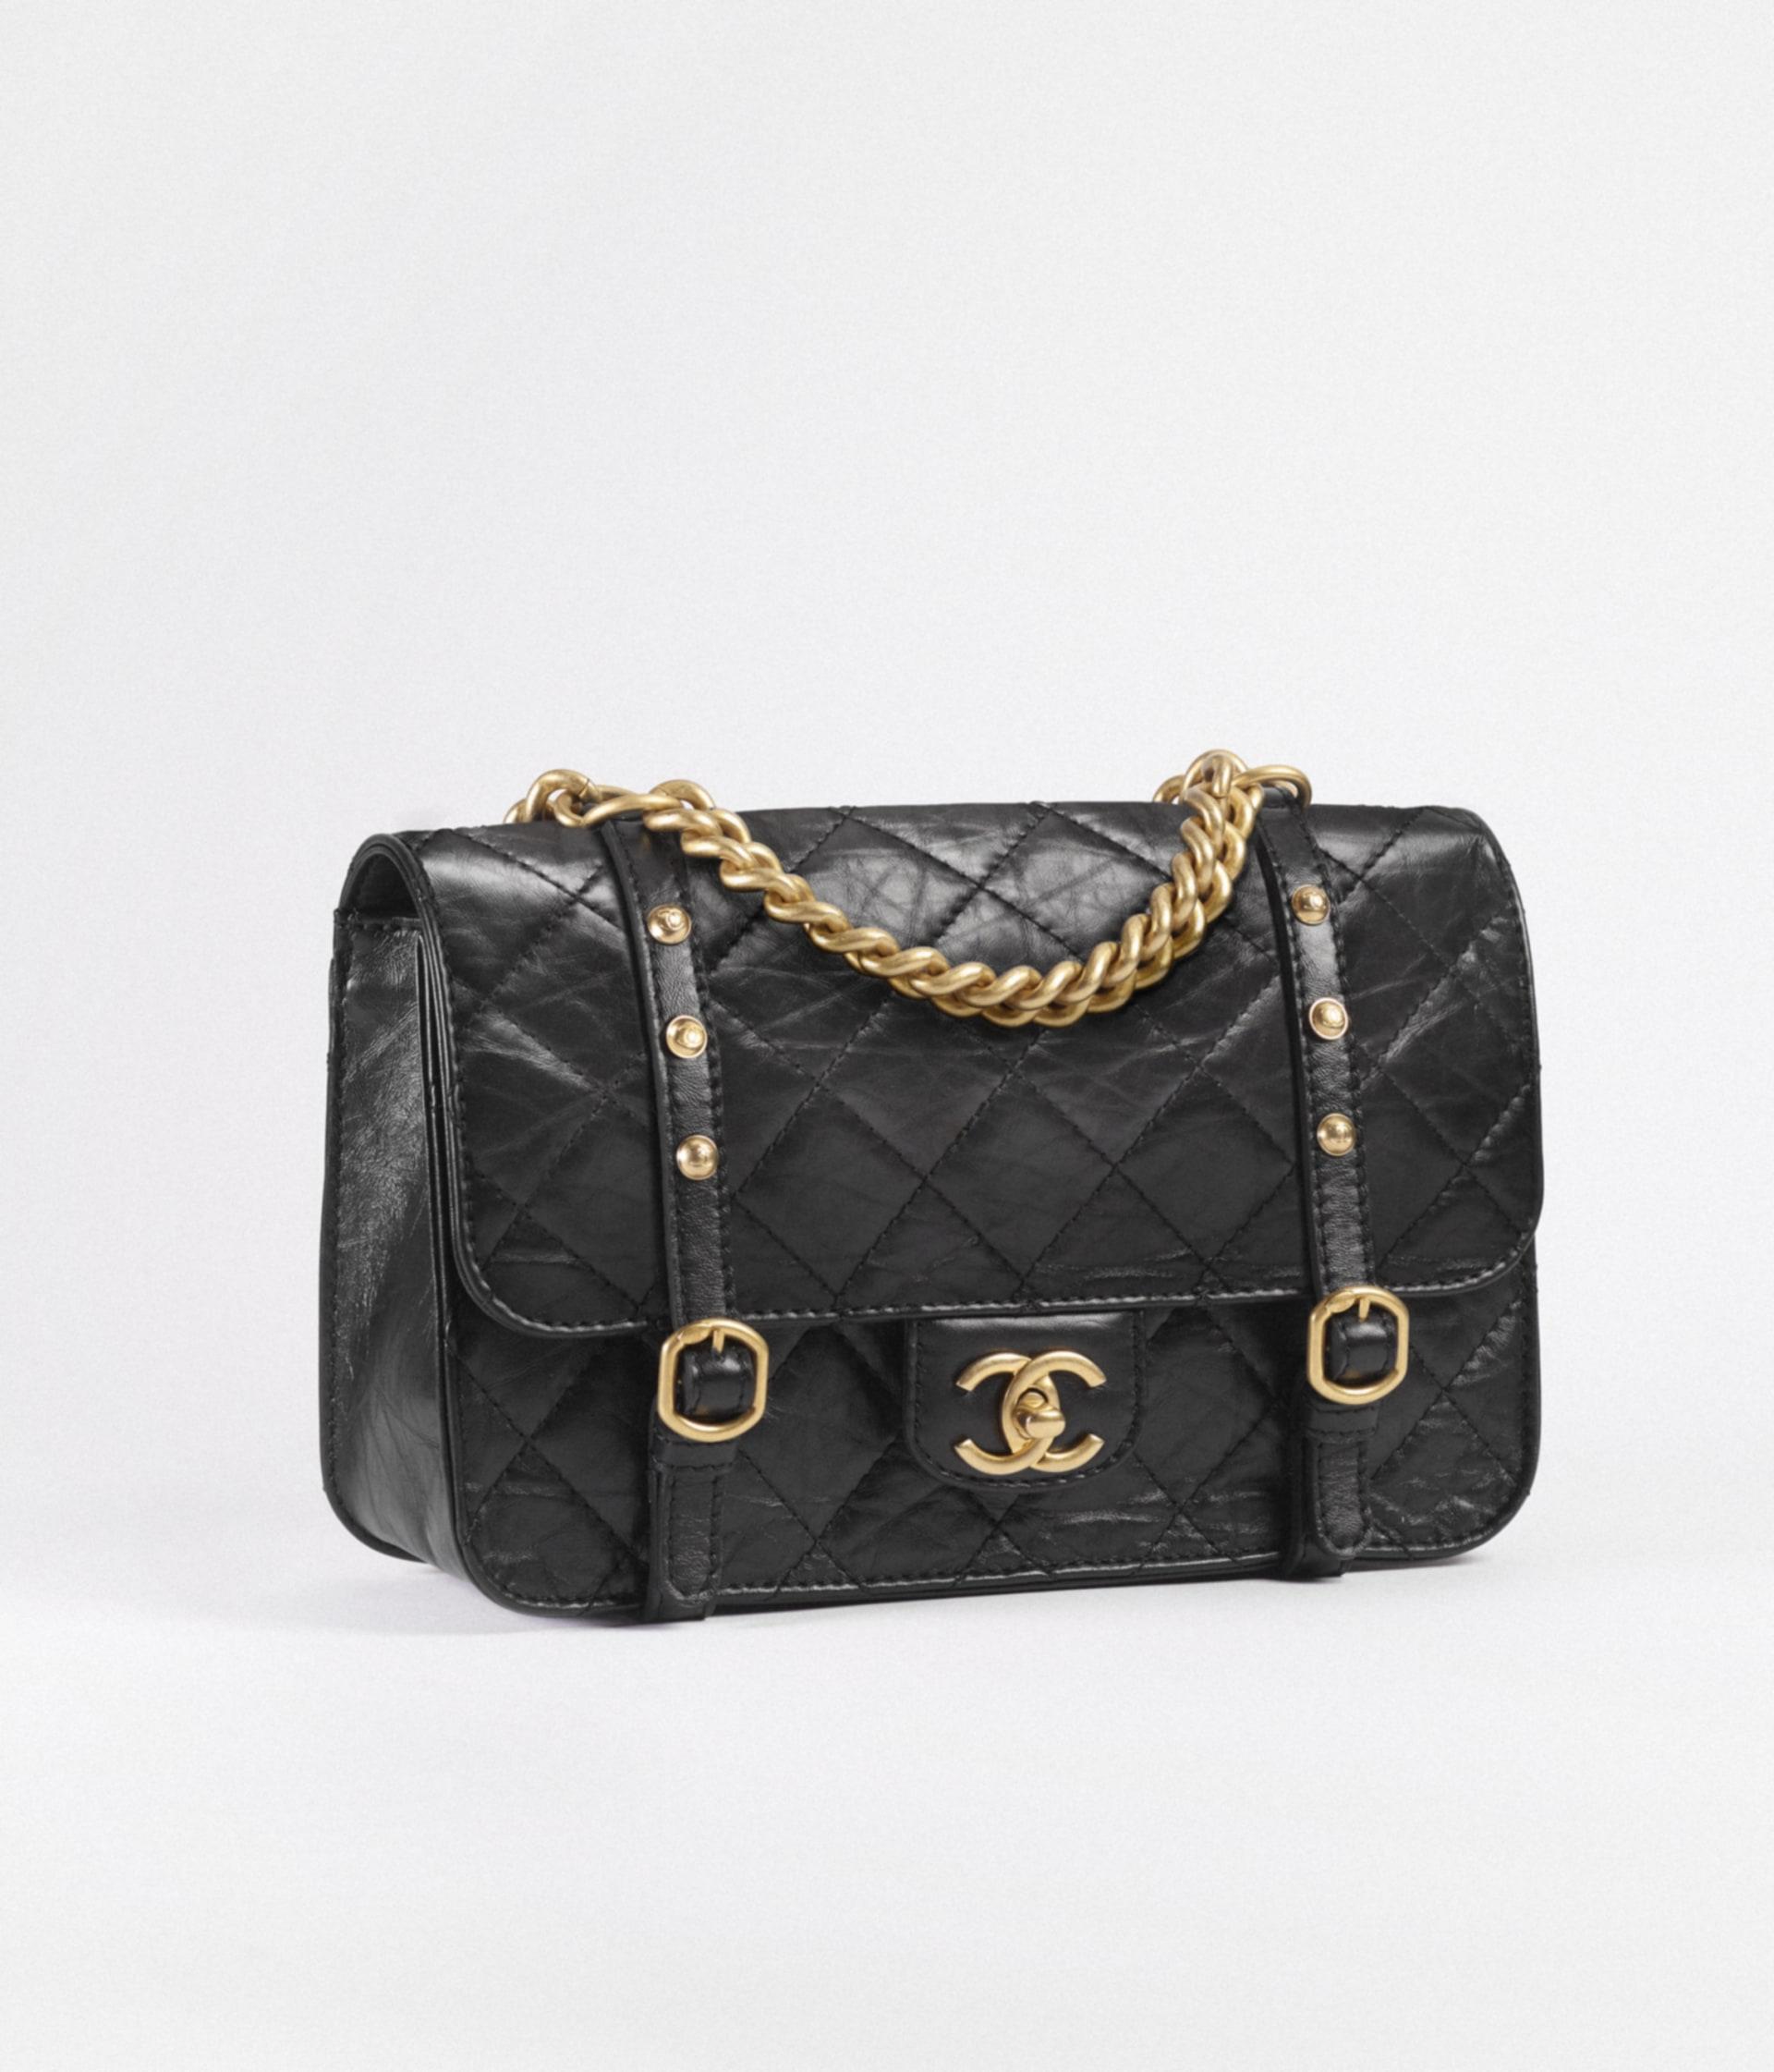 image 2 - Flap Bag - Aged Calfskin & Gold-Tone Metal - Black